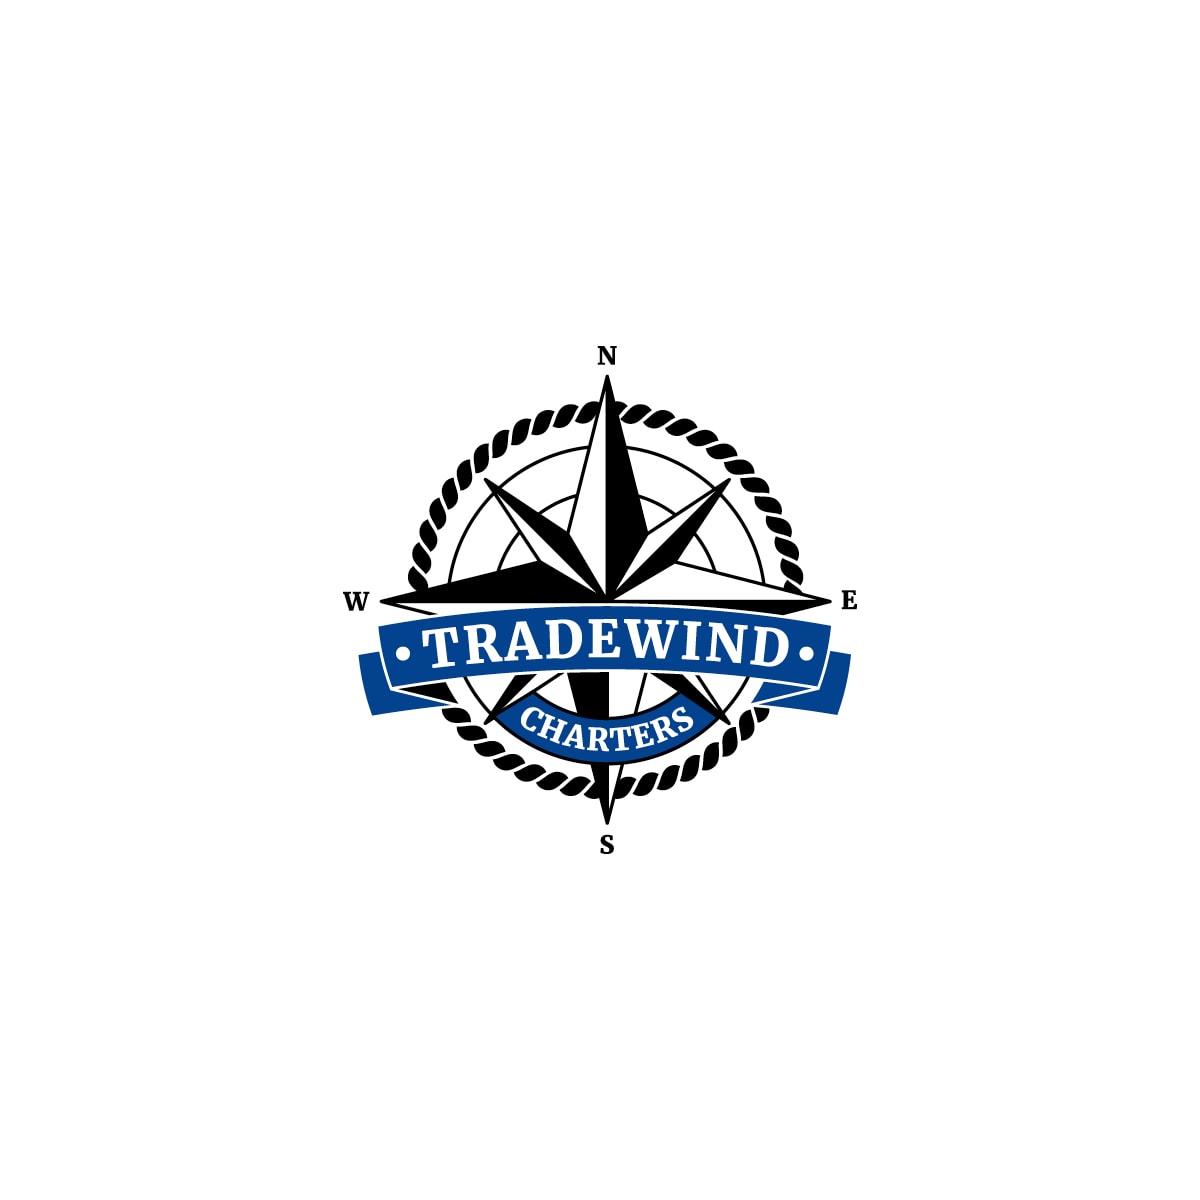 Tradewind Charters